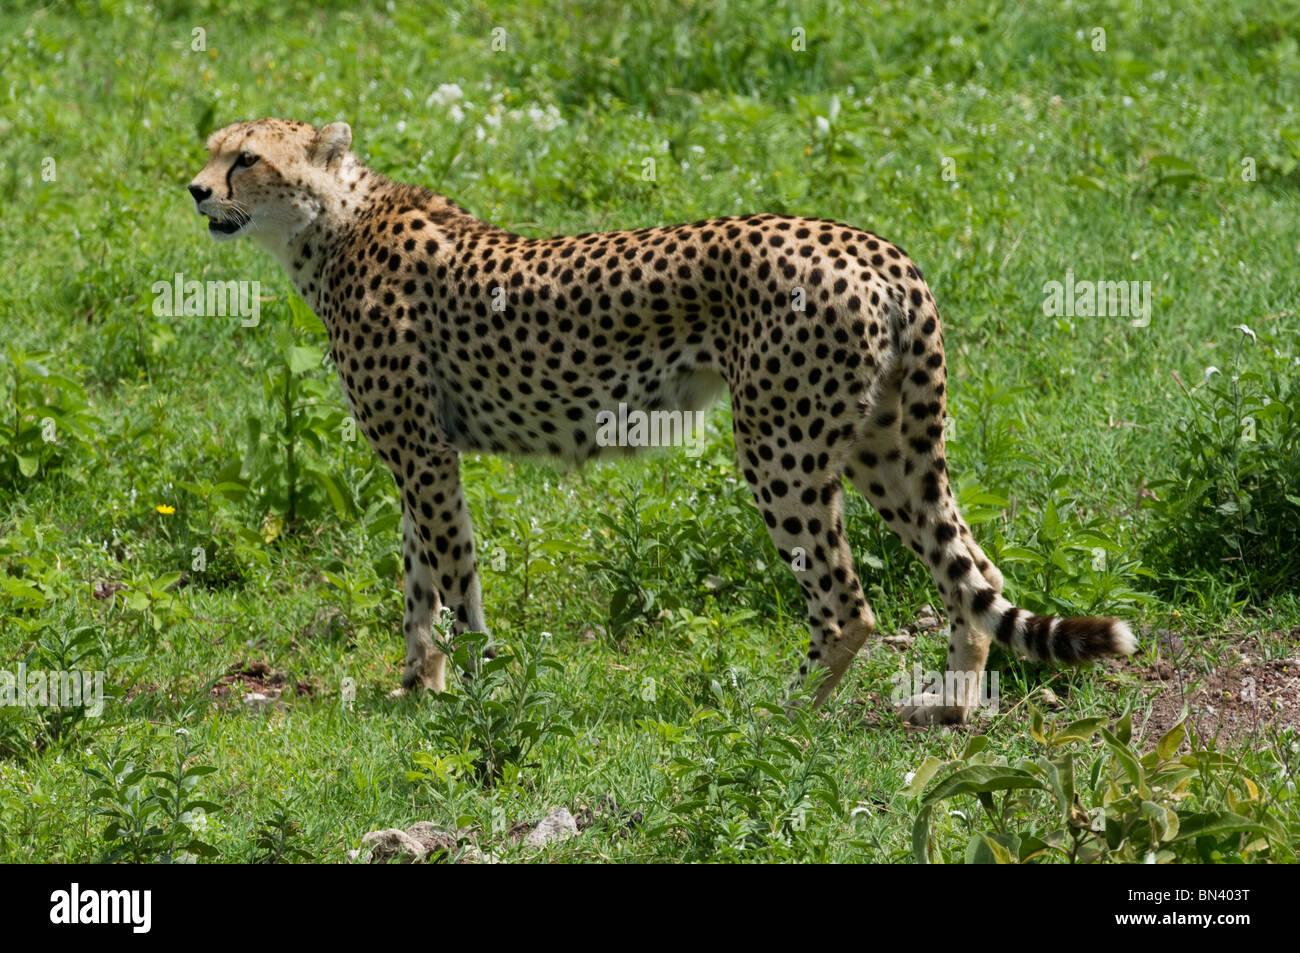 Cheetah standing alert in the grass - Stock Image